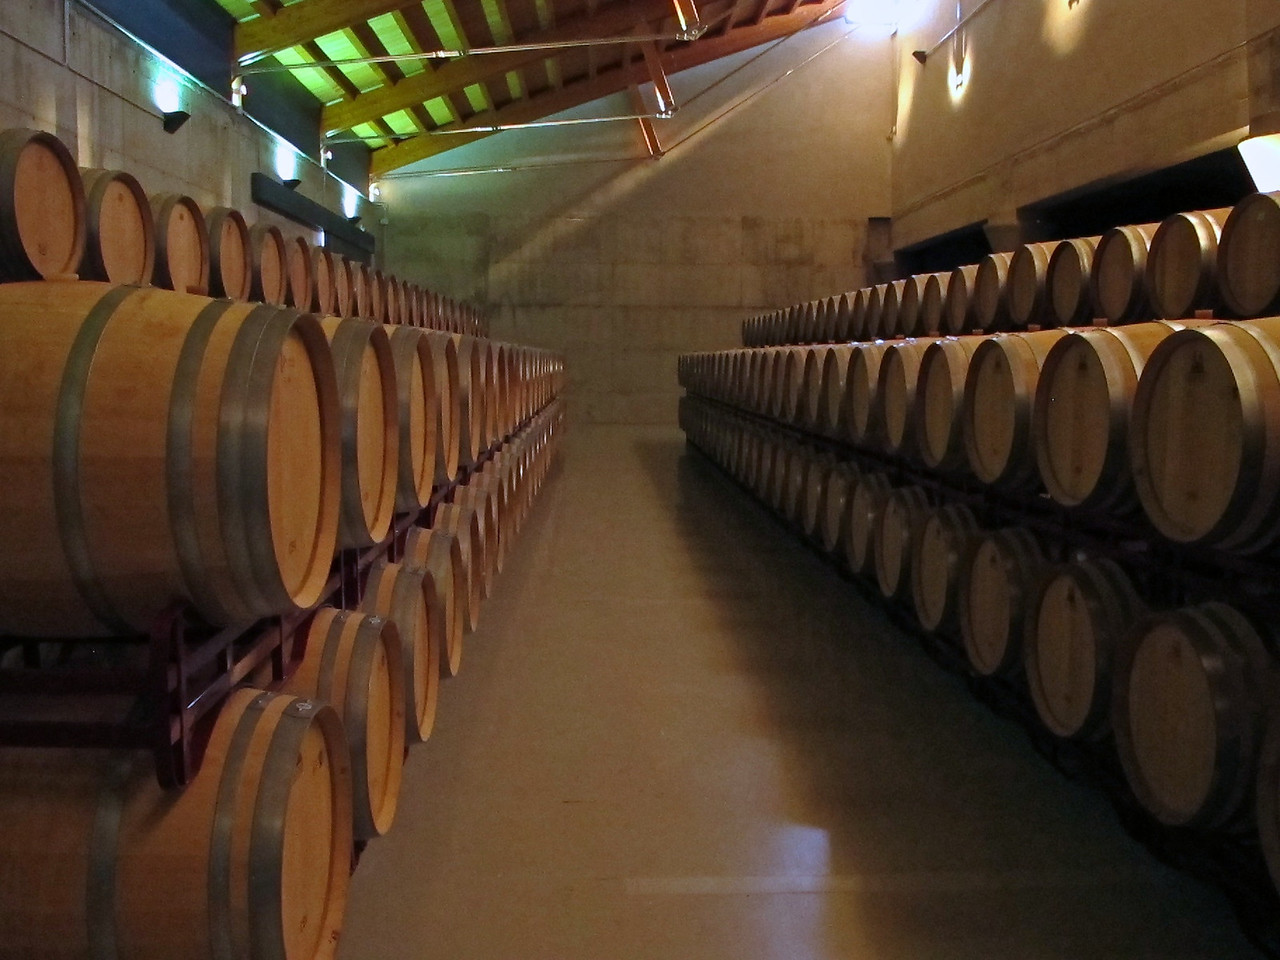 After fermentation, the wine is then put into oak barrels.